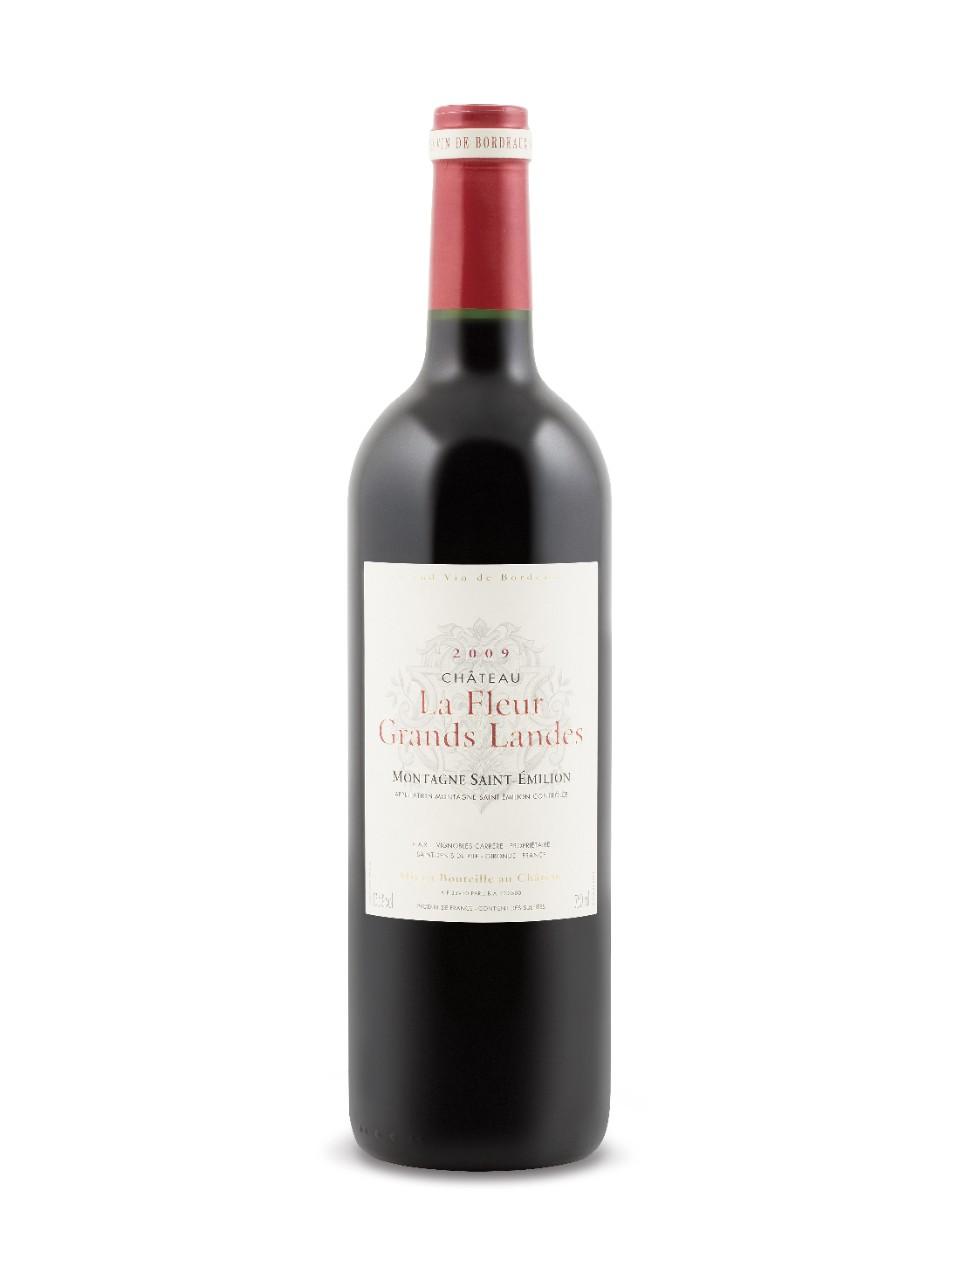 Image for Château La Fleur Grands Landes 2015 from LCBO